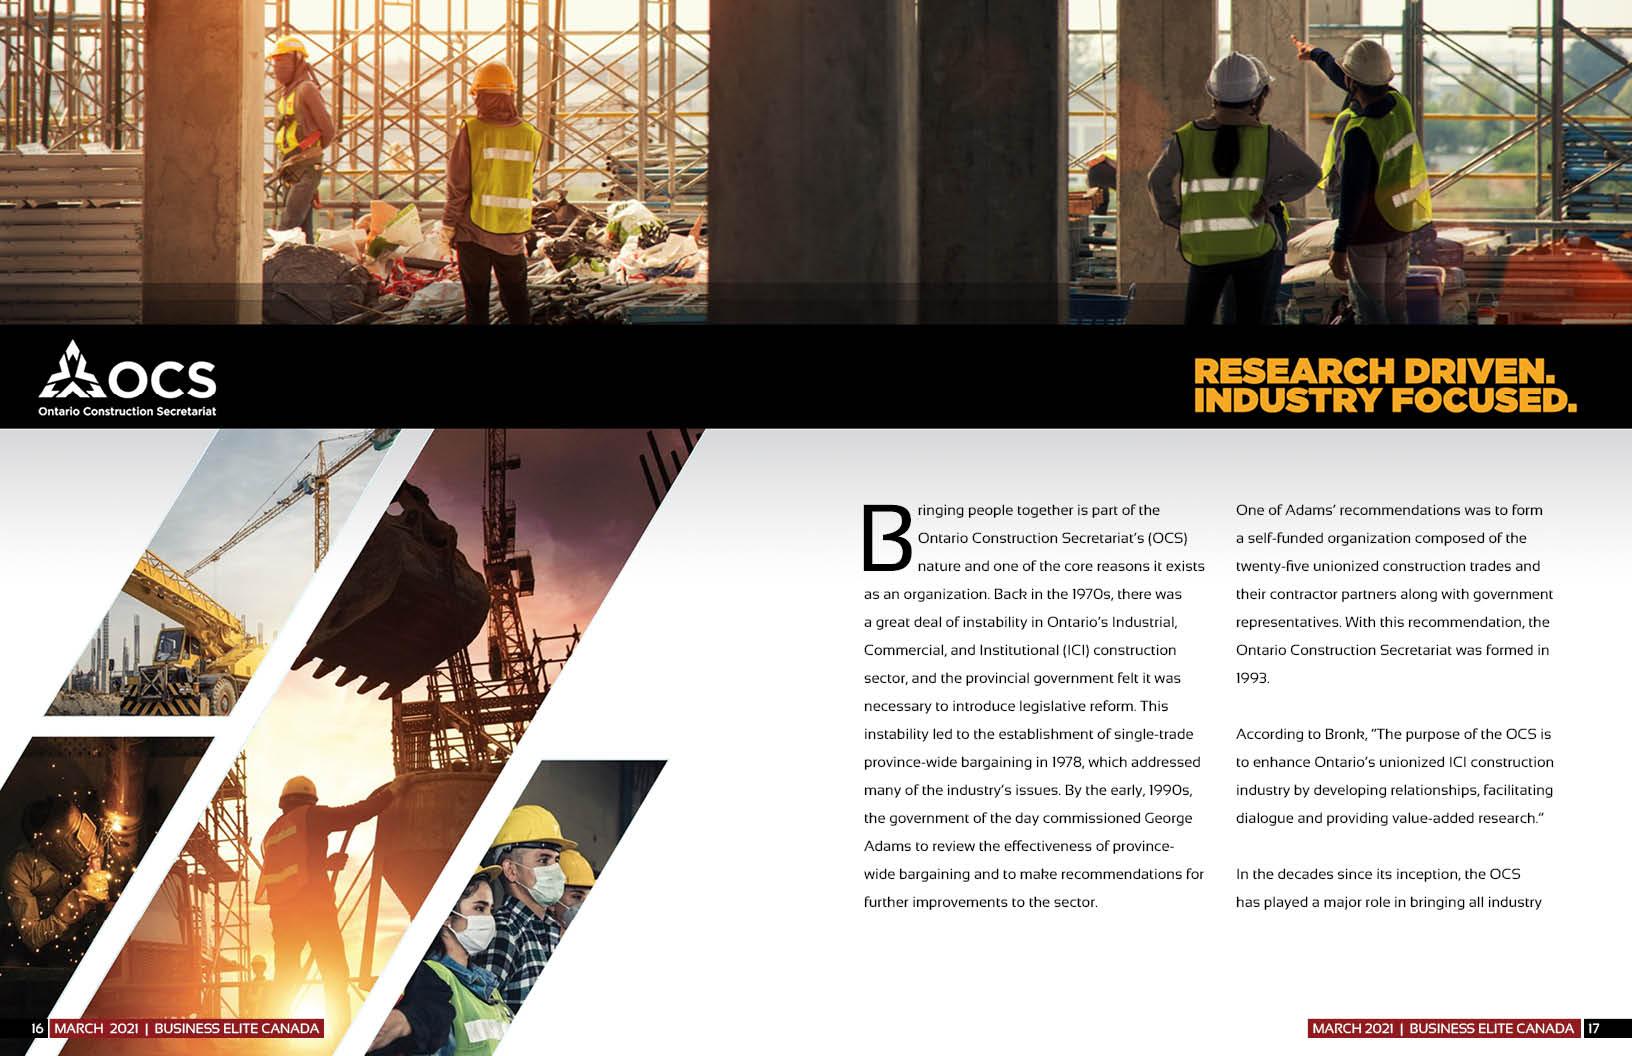 Ontario Construction Secretariat (OCS)